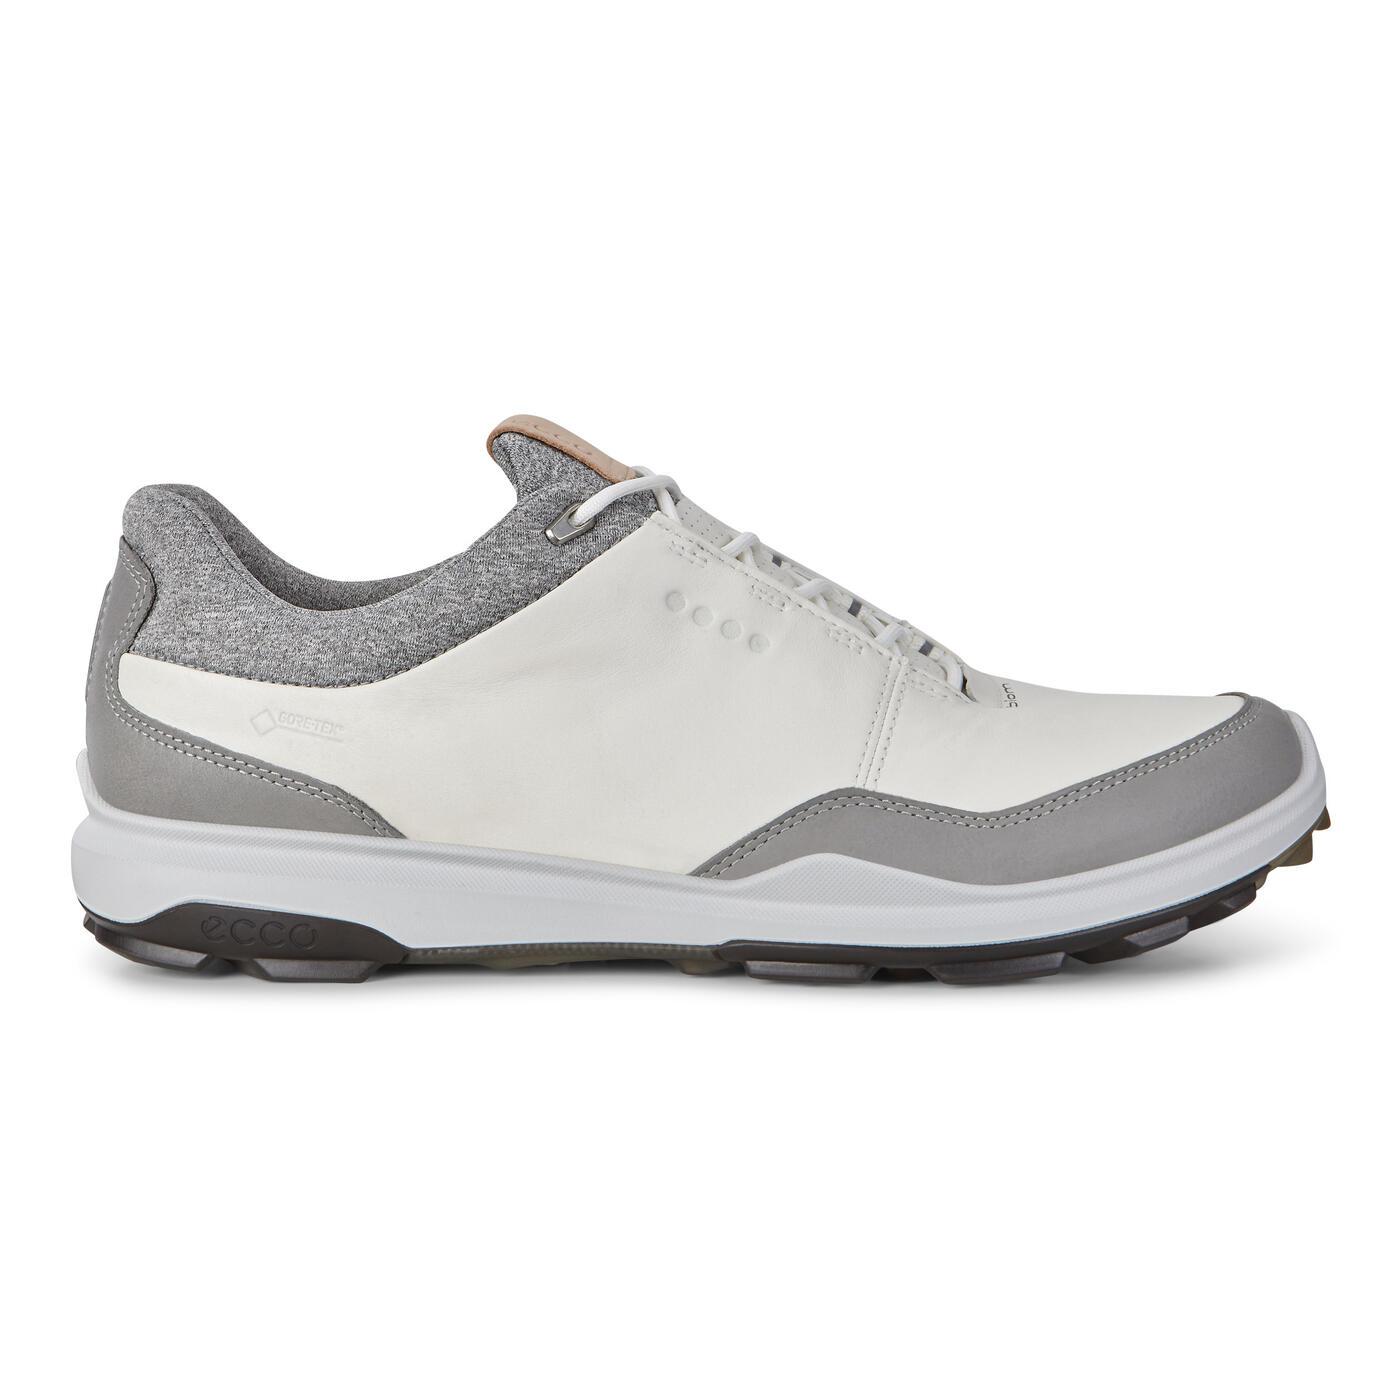 Ecco Men S Biom Hybrid Gore Tex Golf Shoes Ecco Shoes